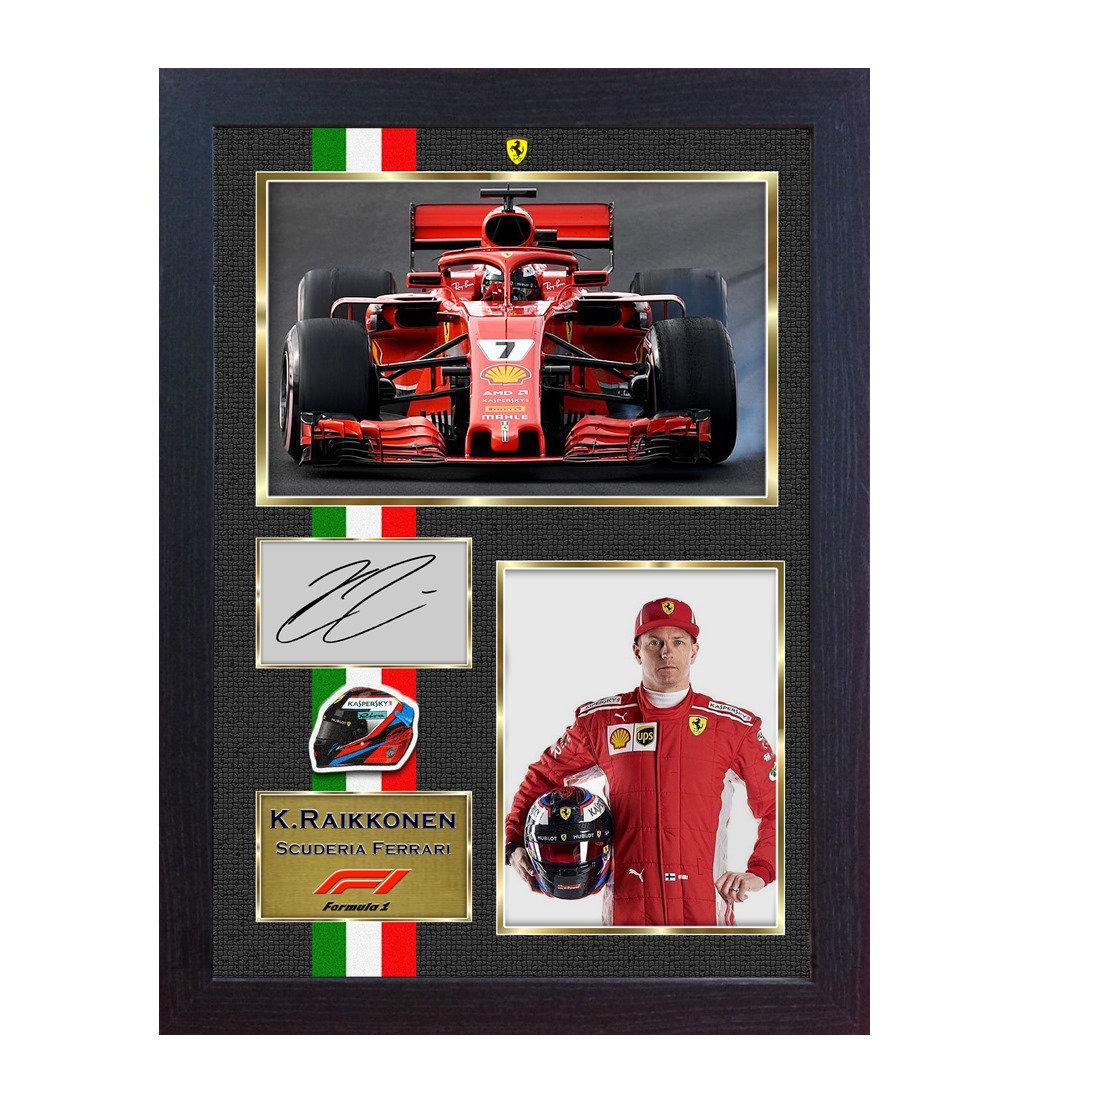 Neue 2018 Kimi Räikkönen Ferrari Formel1 signiertes Autogramm